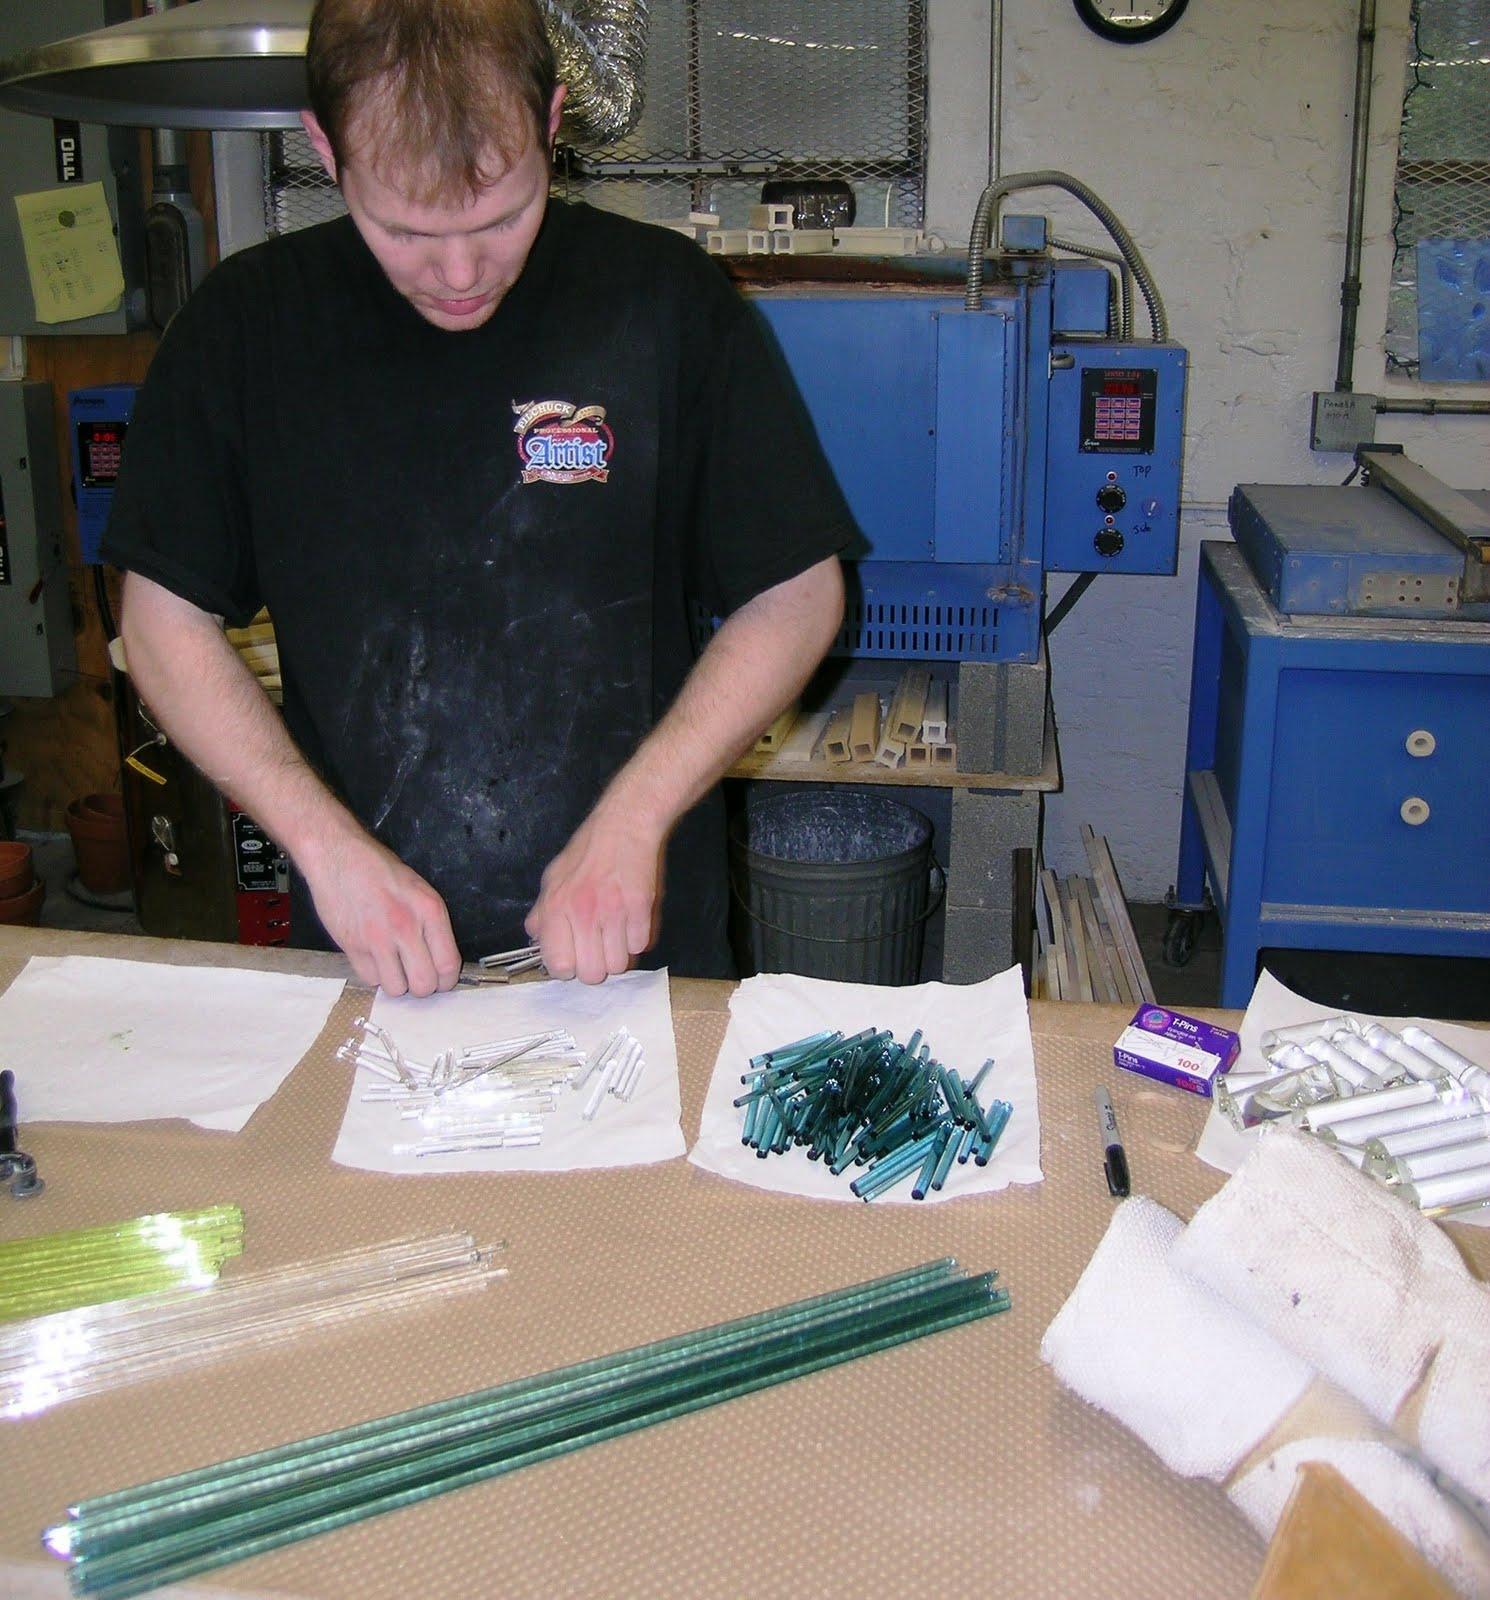 http://1.bp.blogspot.com/_QcgygS7hLn0/TK5I0su-SII/AAAAAAAACGc/8KwF-zdaVGQ/s1600/robert_kincheloe.casting.borosilicate.glass.JPG